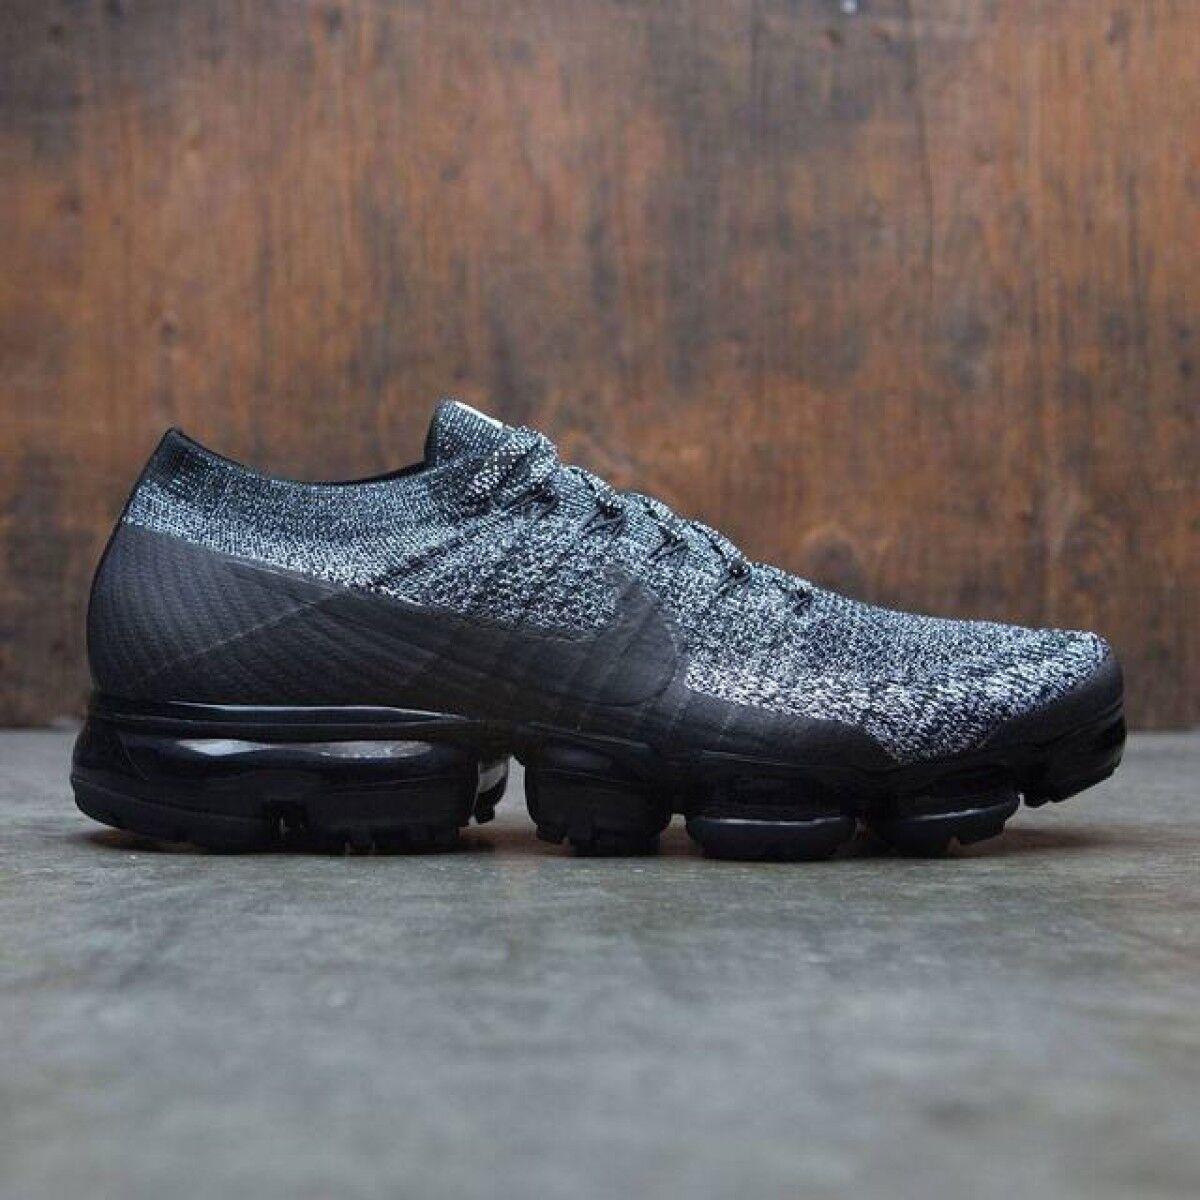 b211515c6a Nike Vapormax Flyknit Black White Oreo Size 7. 849558-041 air max 2018 90